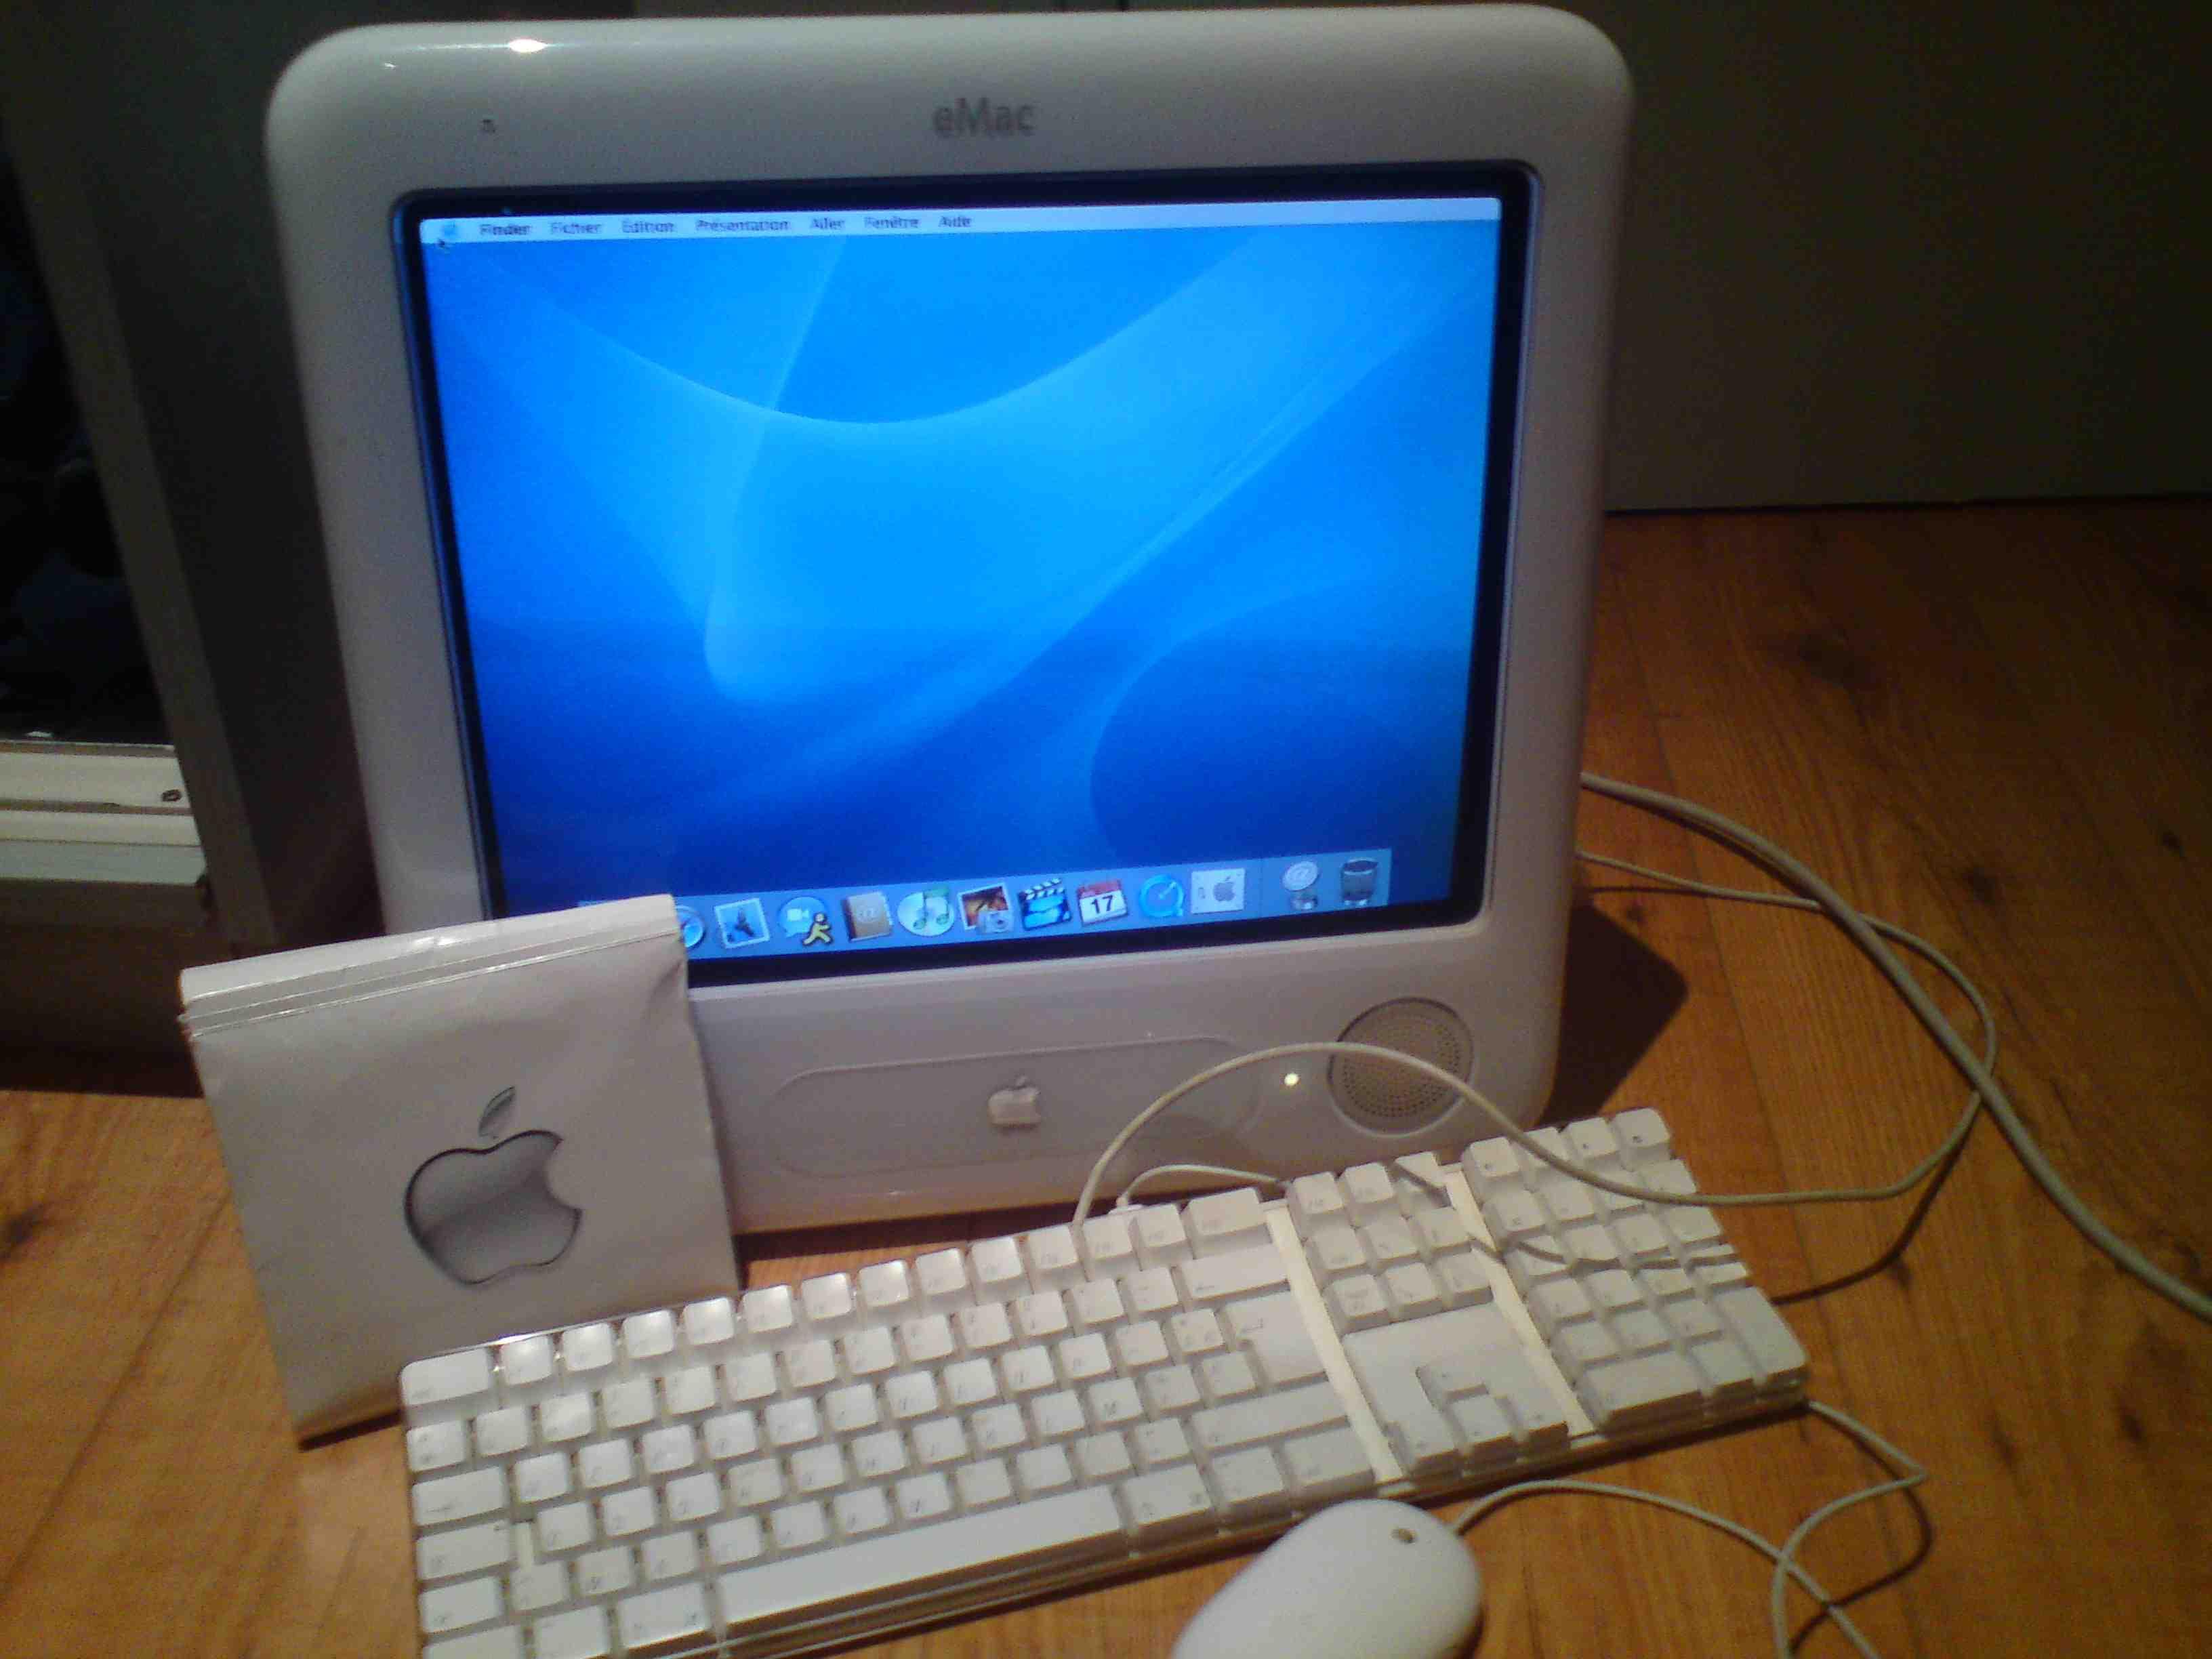 Apple Emac G4 1 Ghz Image 148716 Audiofanzine